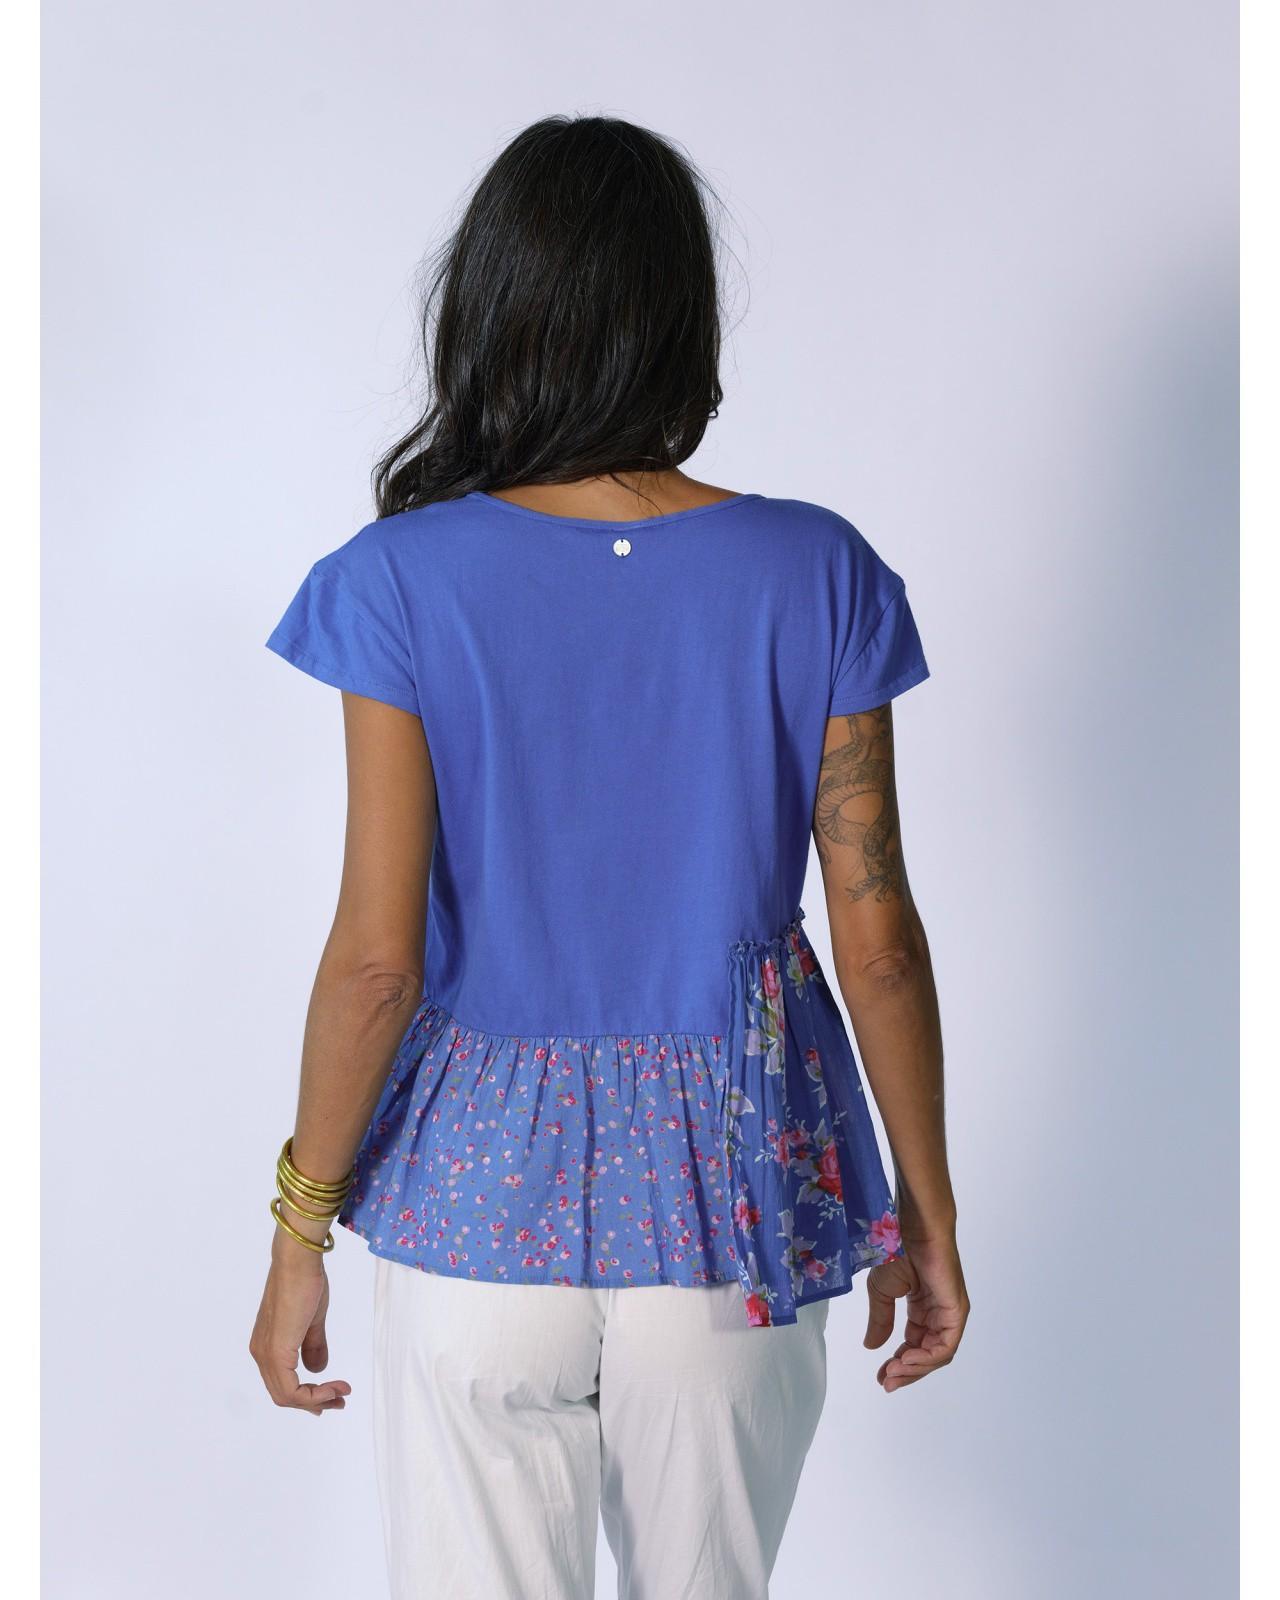 Rhum Raisin blue top, Lavandou 15